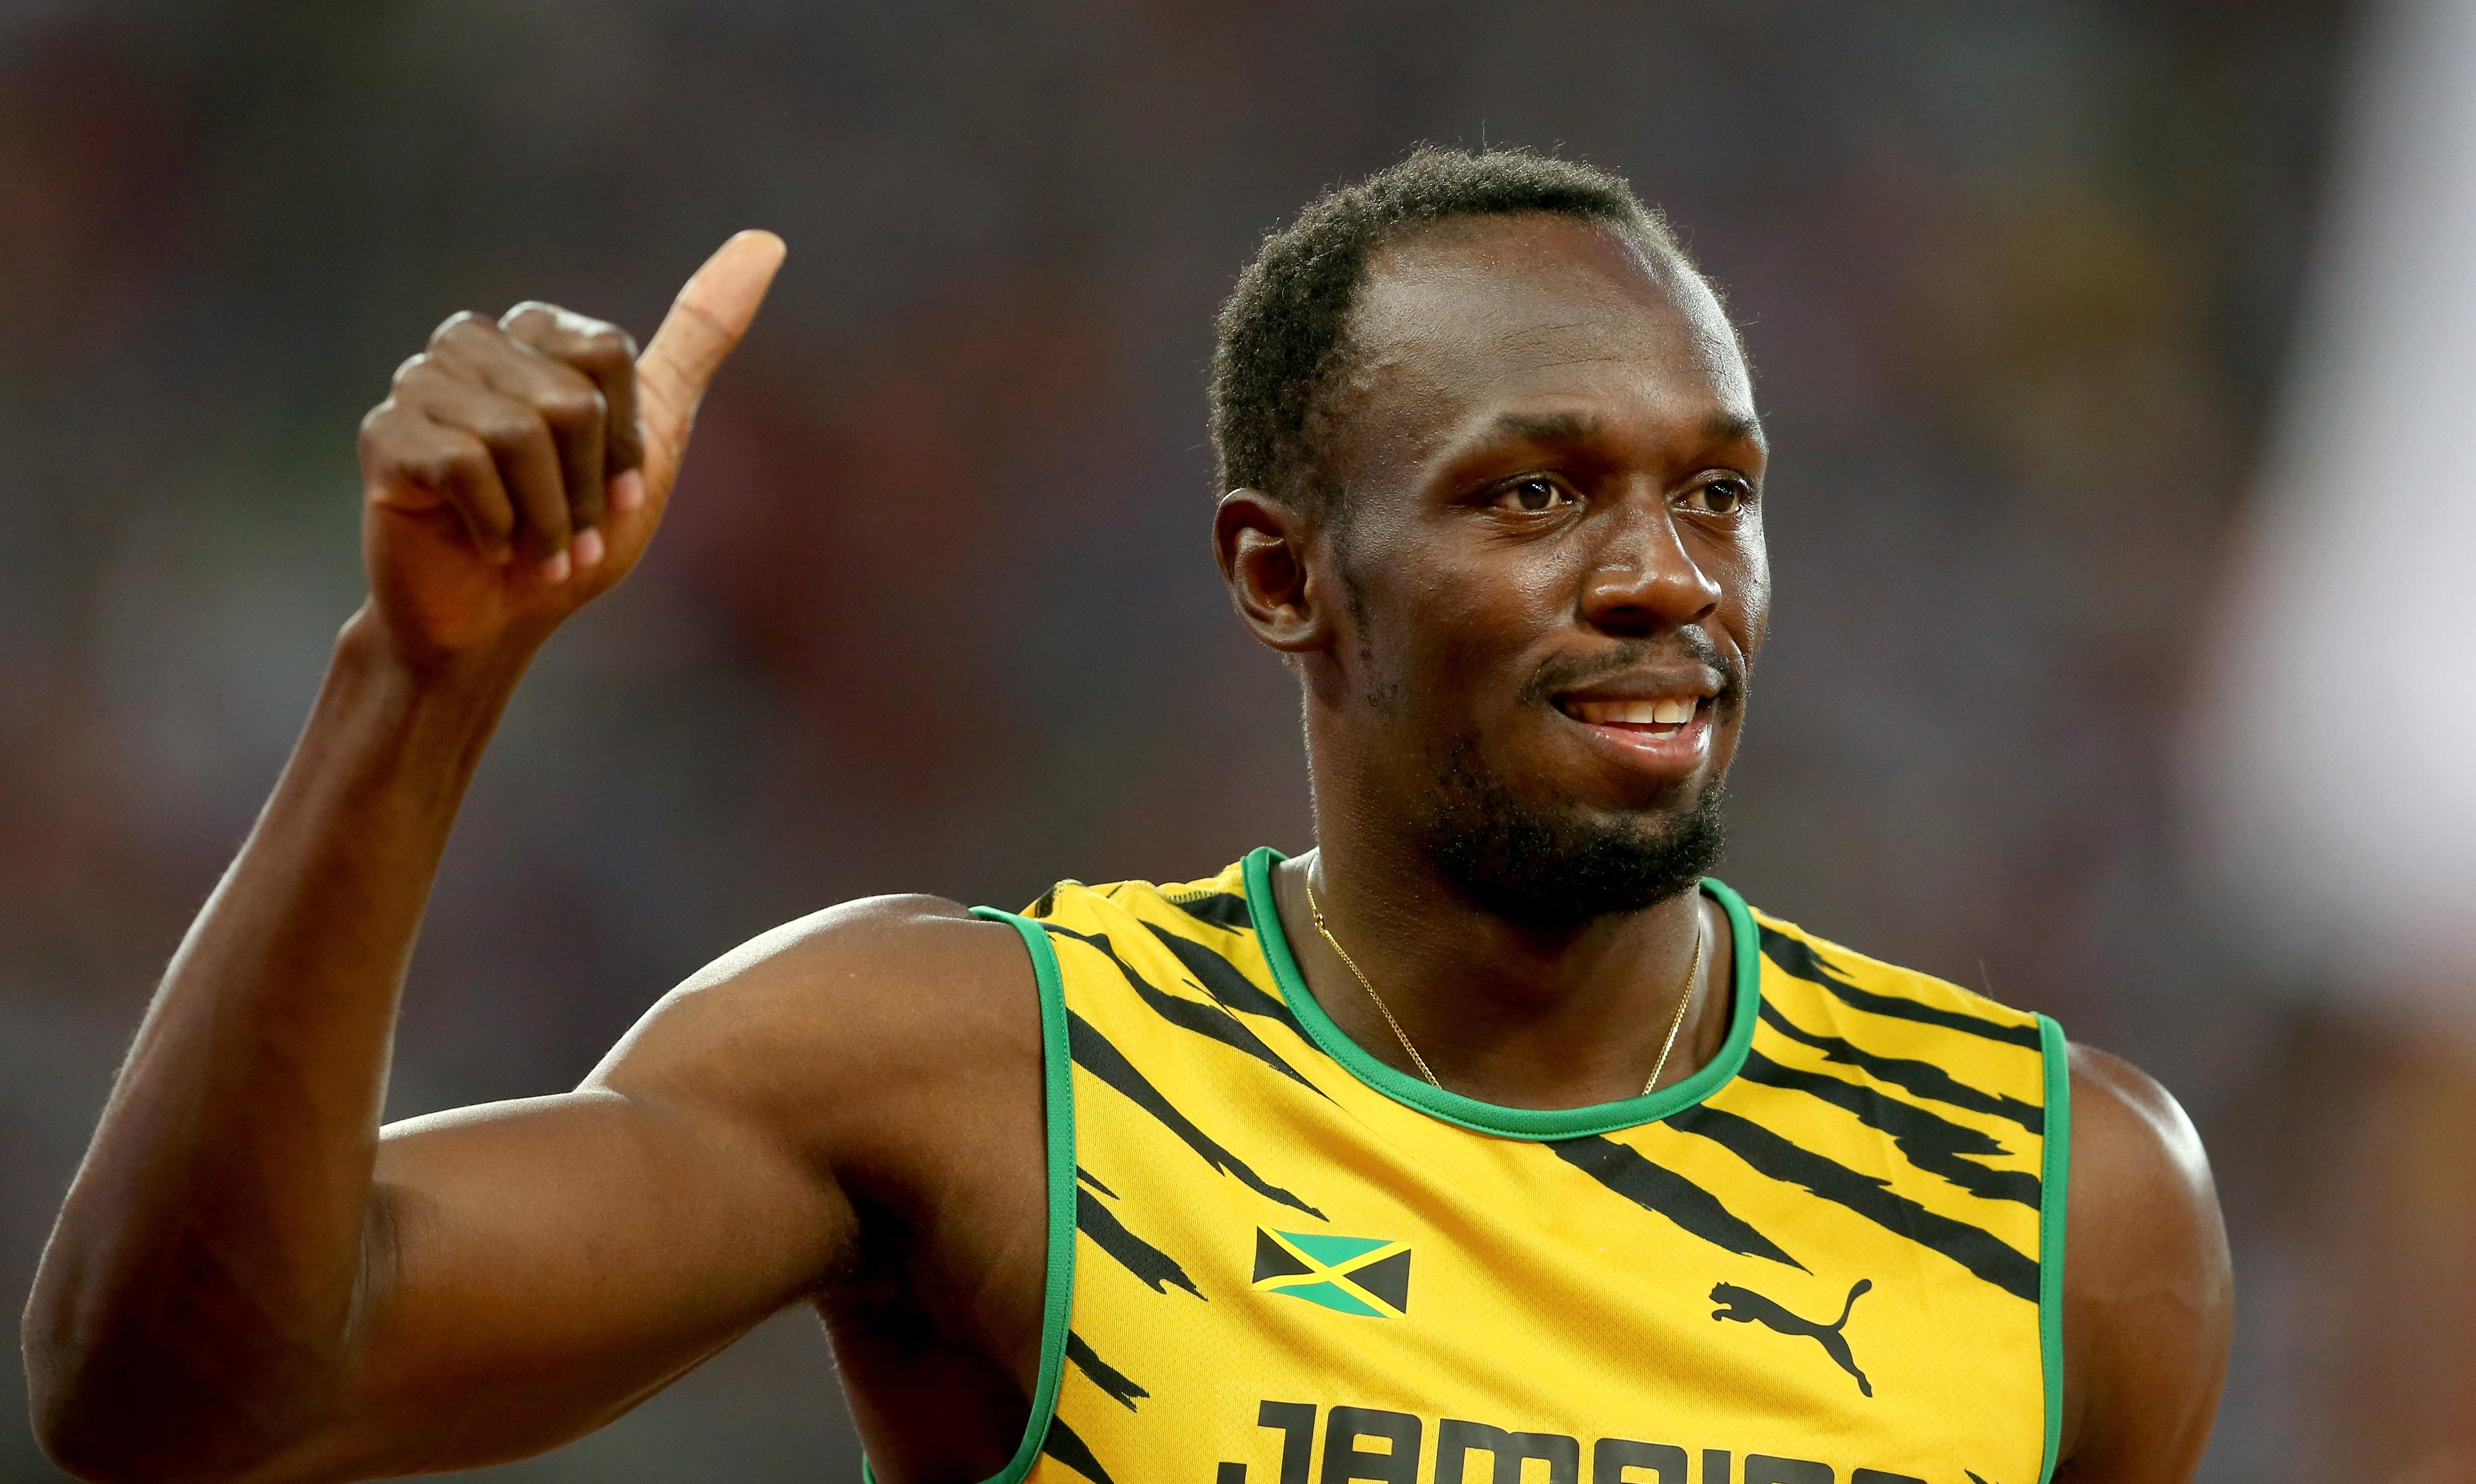 Usain Bolt beats Justin Gatlin to 100m title at World Athletics Championship